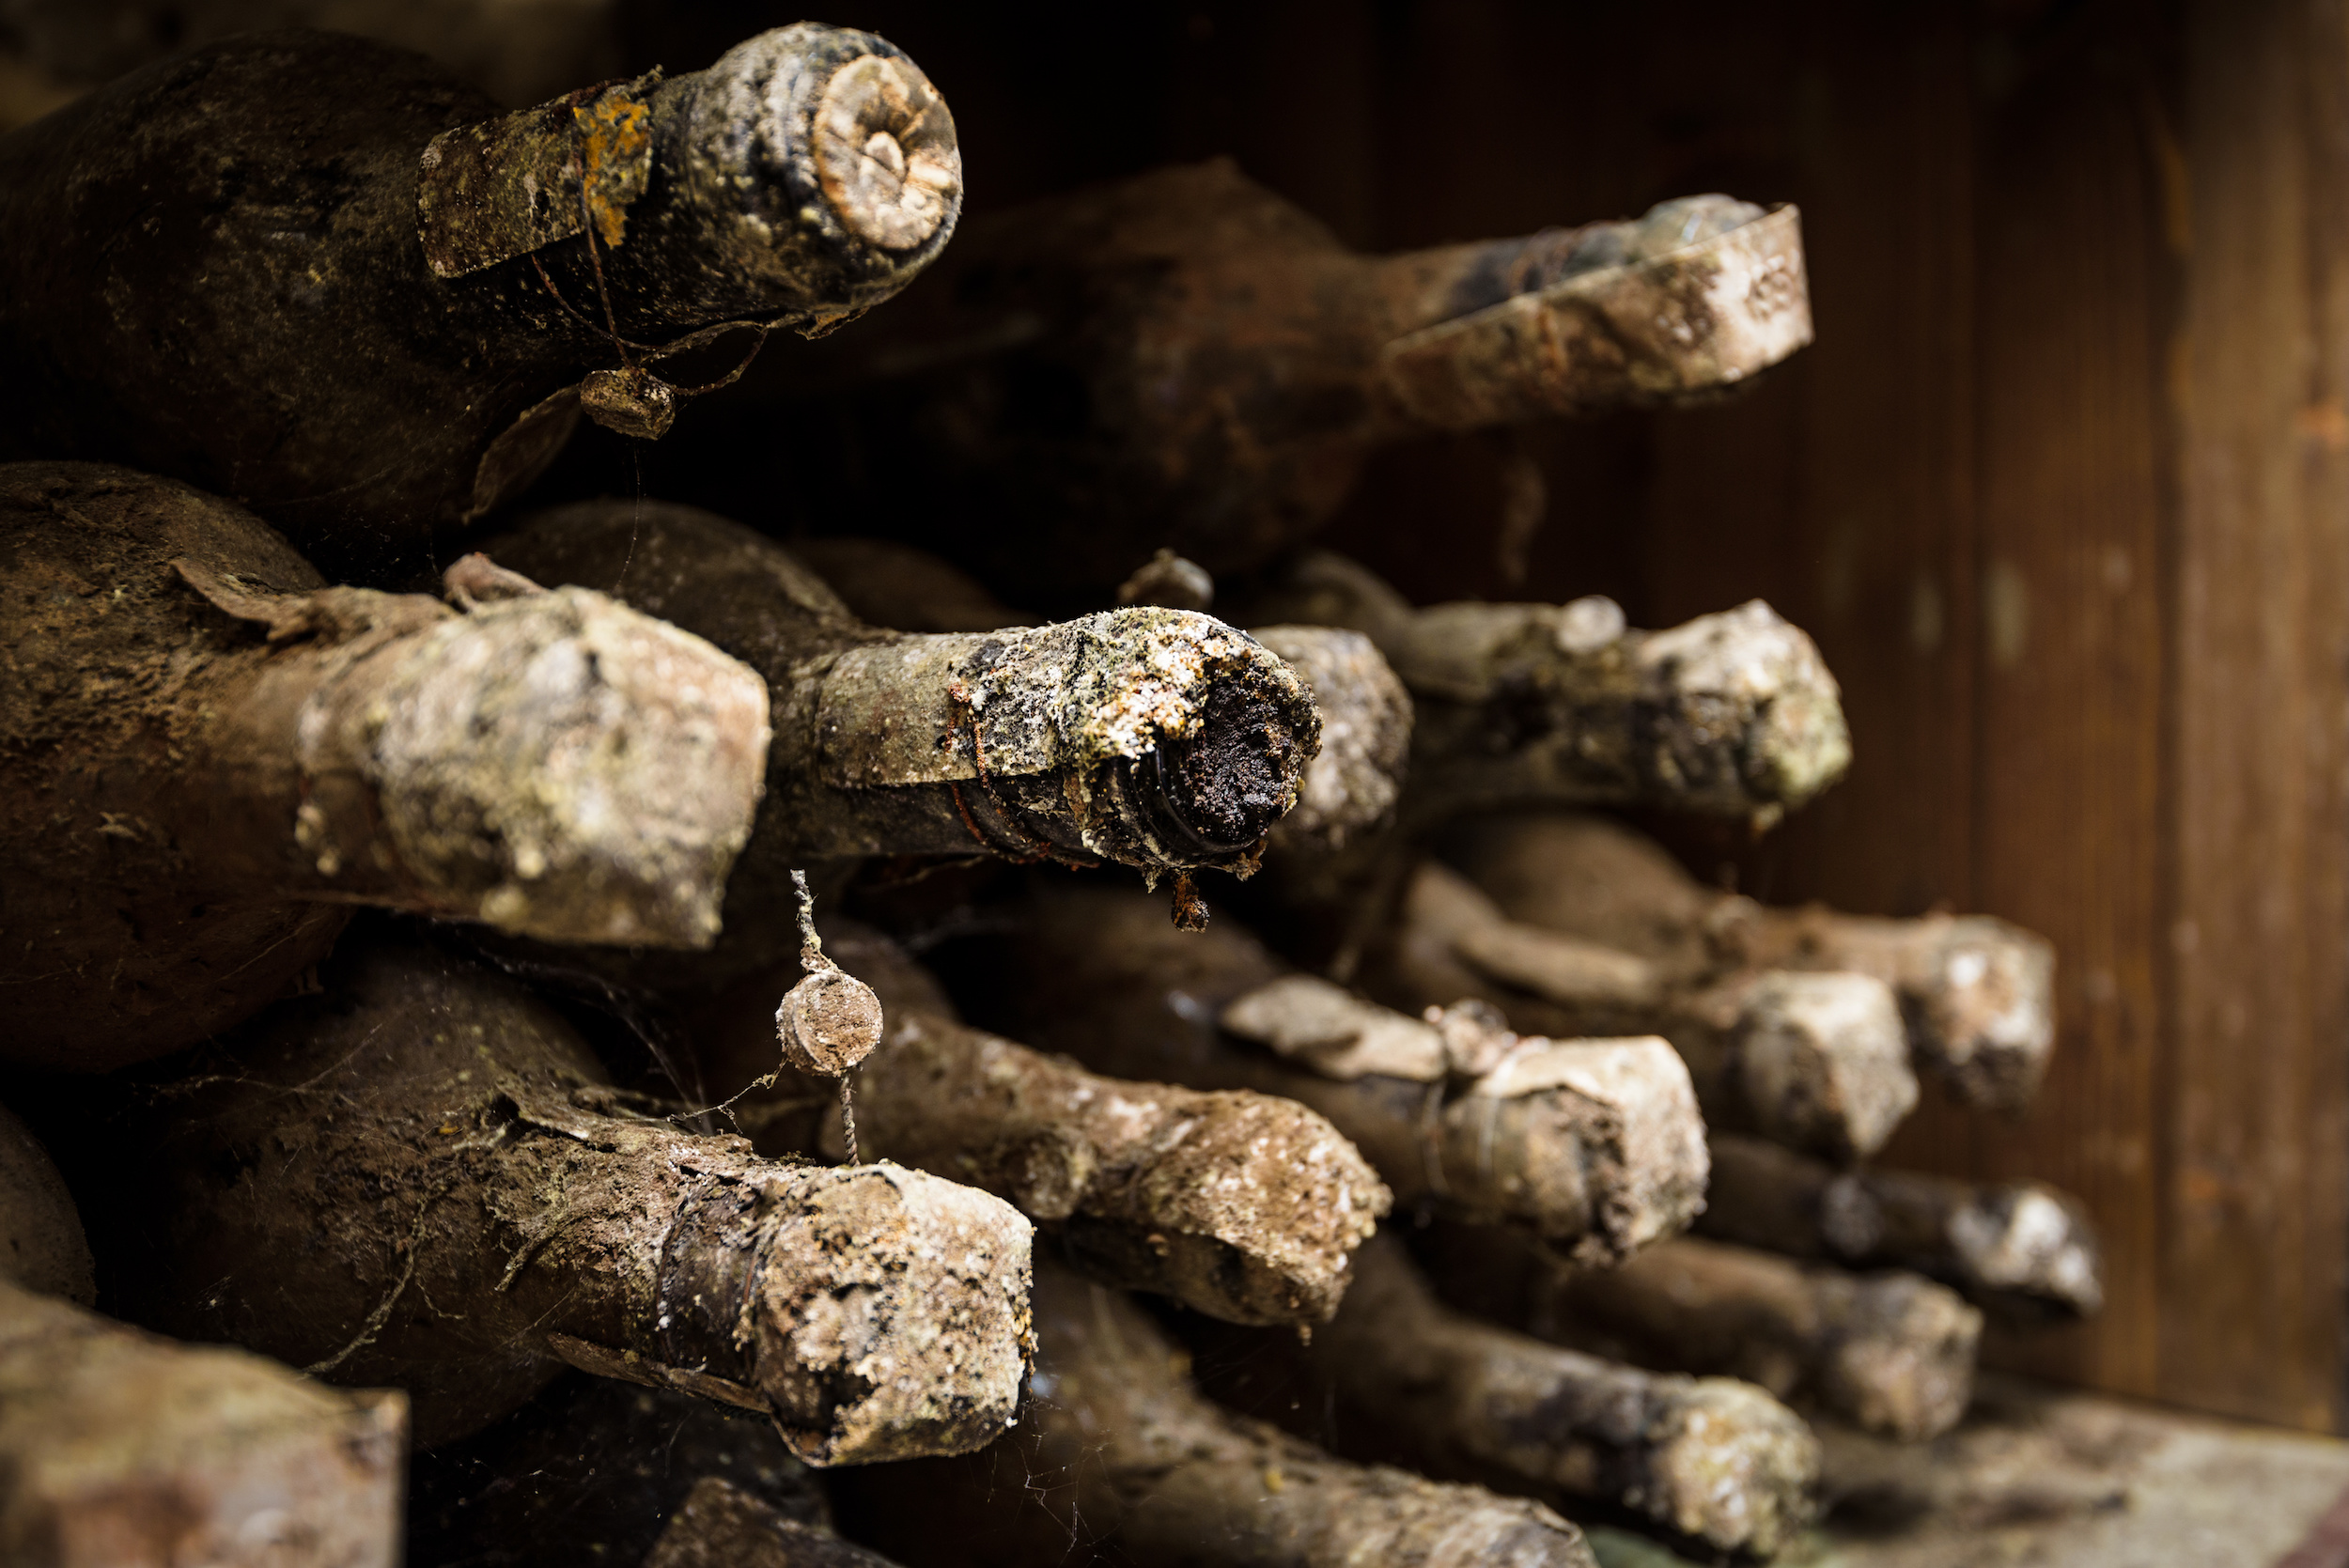 Distilled Spritis - The Last Bar in America